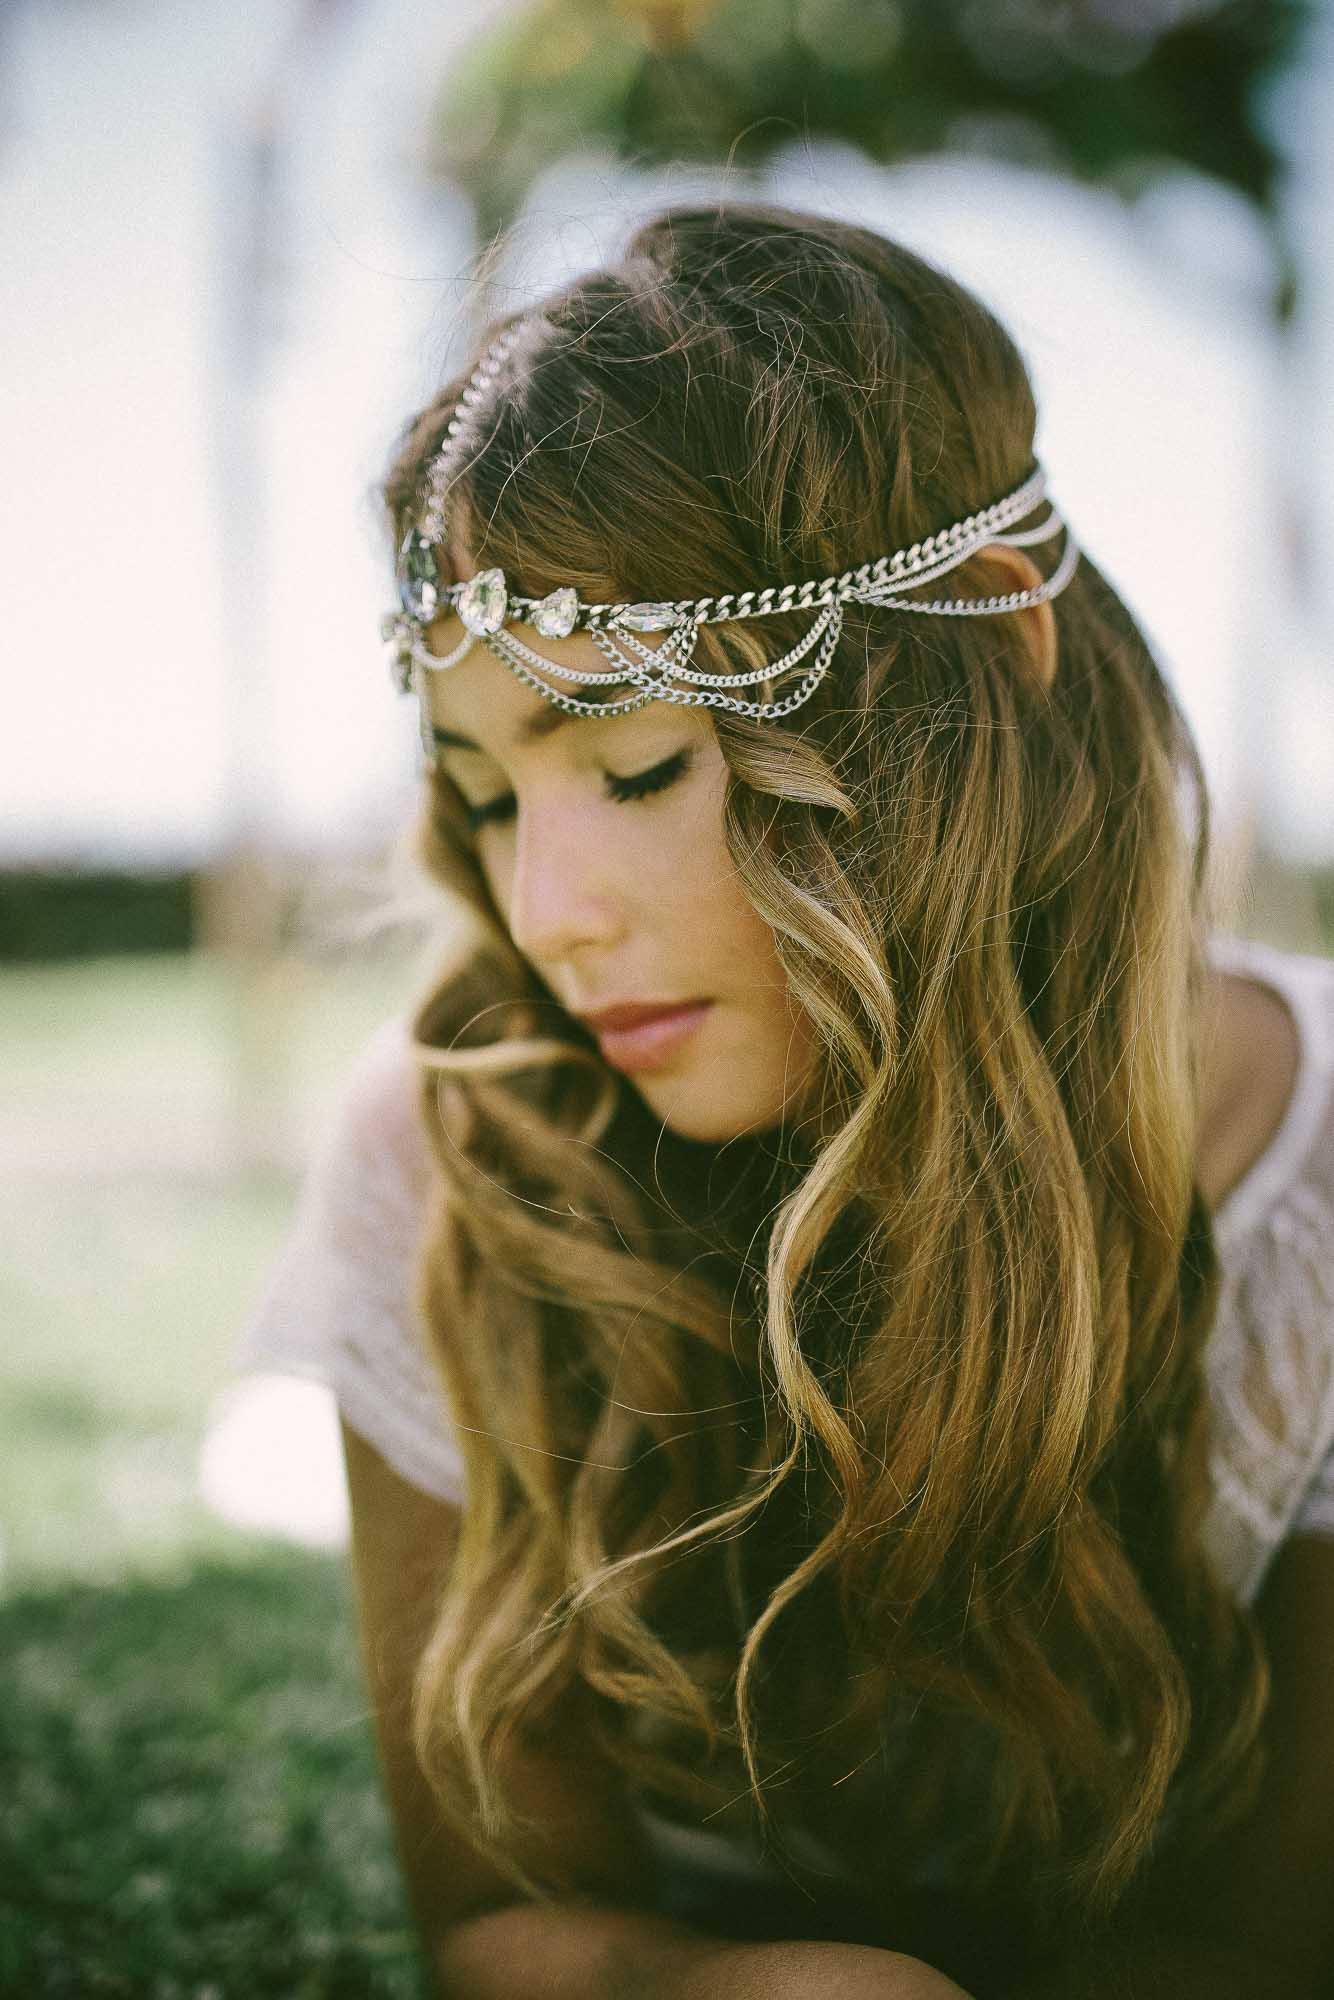 model lying in garden with headpiece by Frankly My Dear